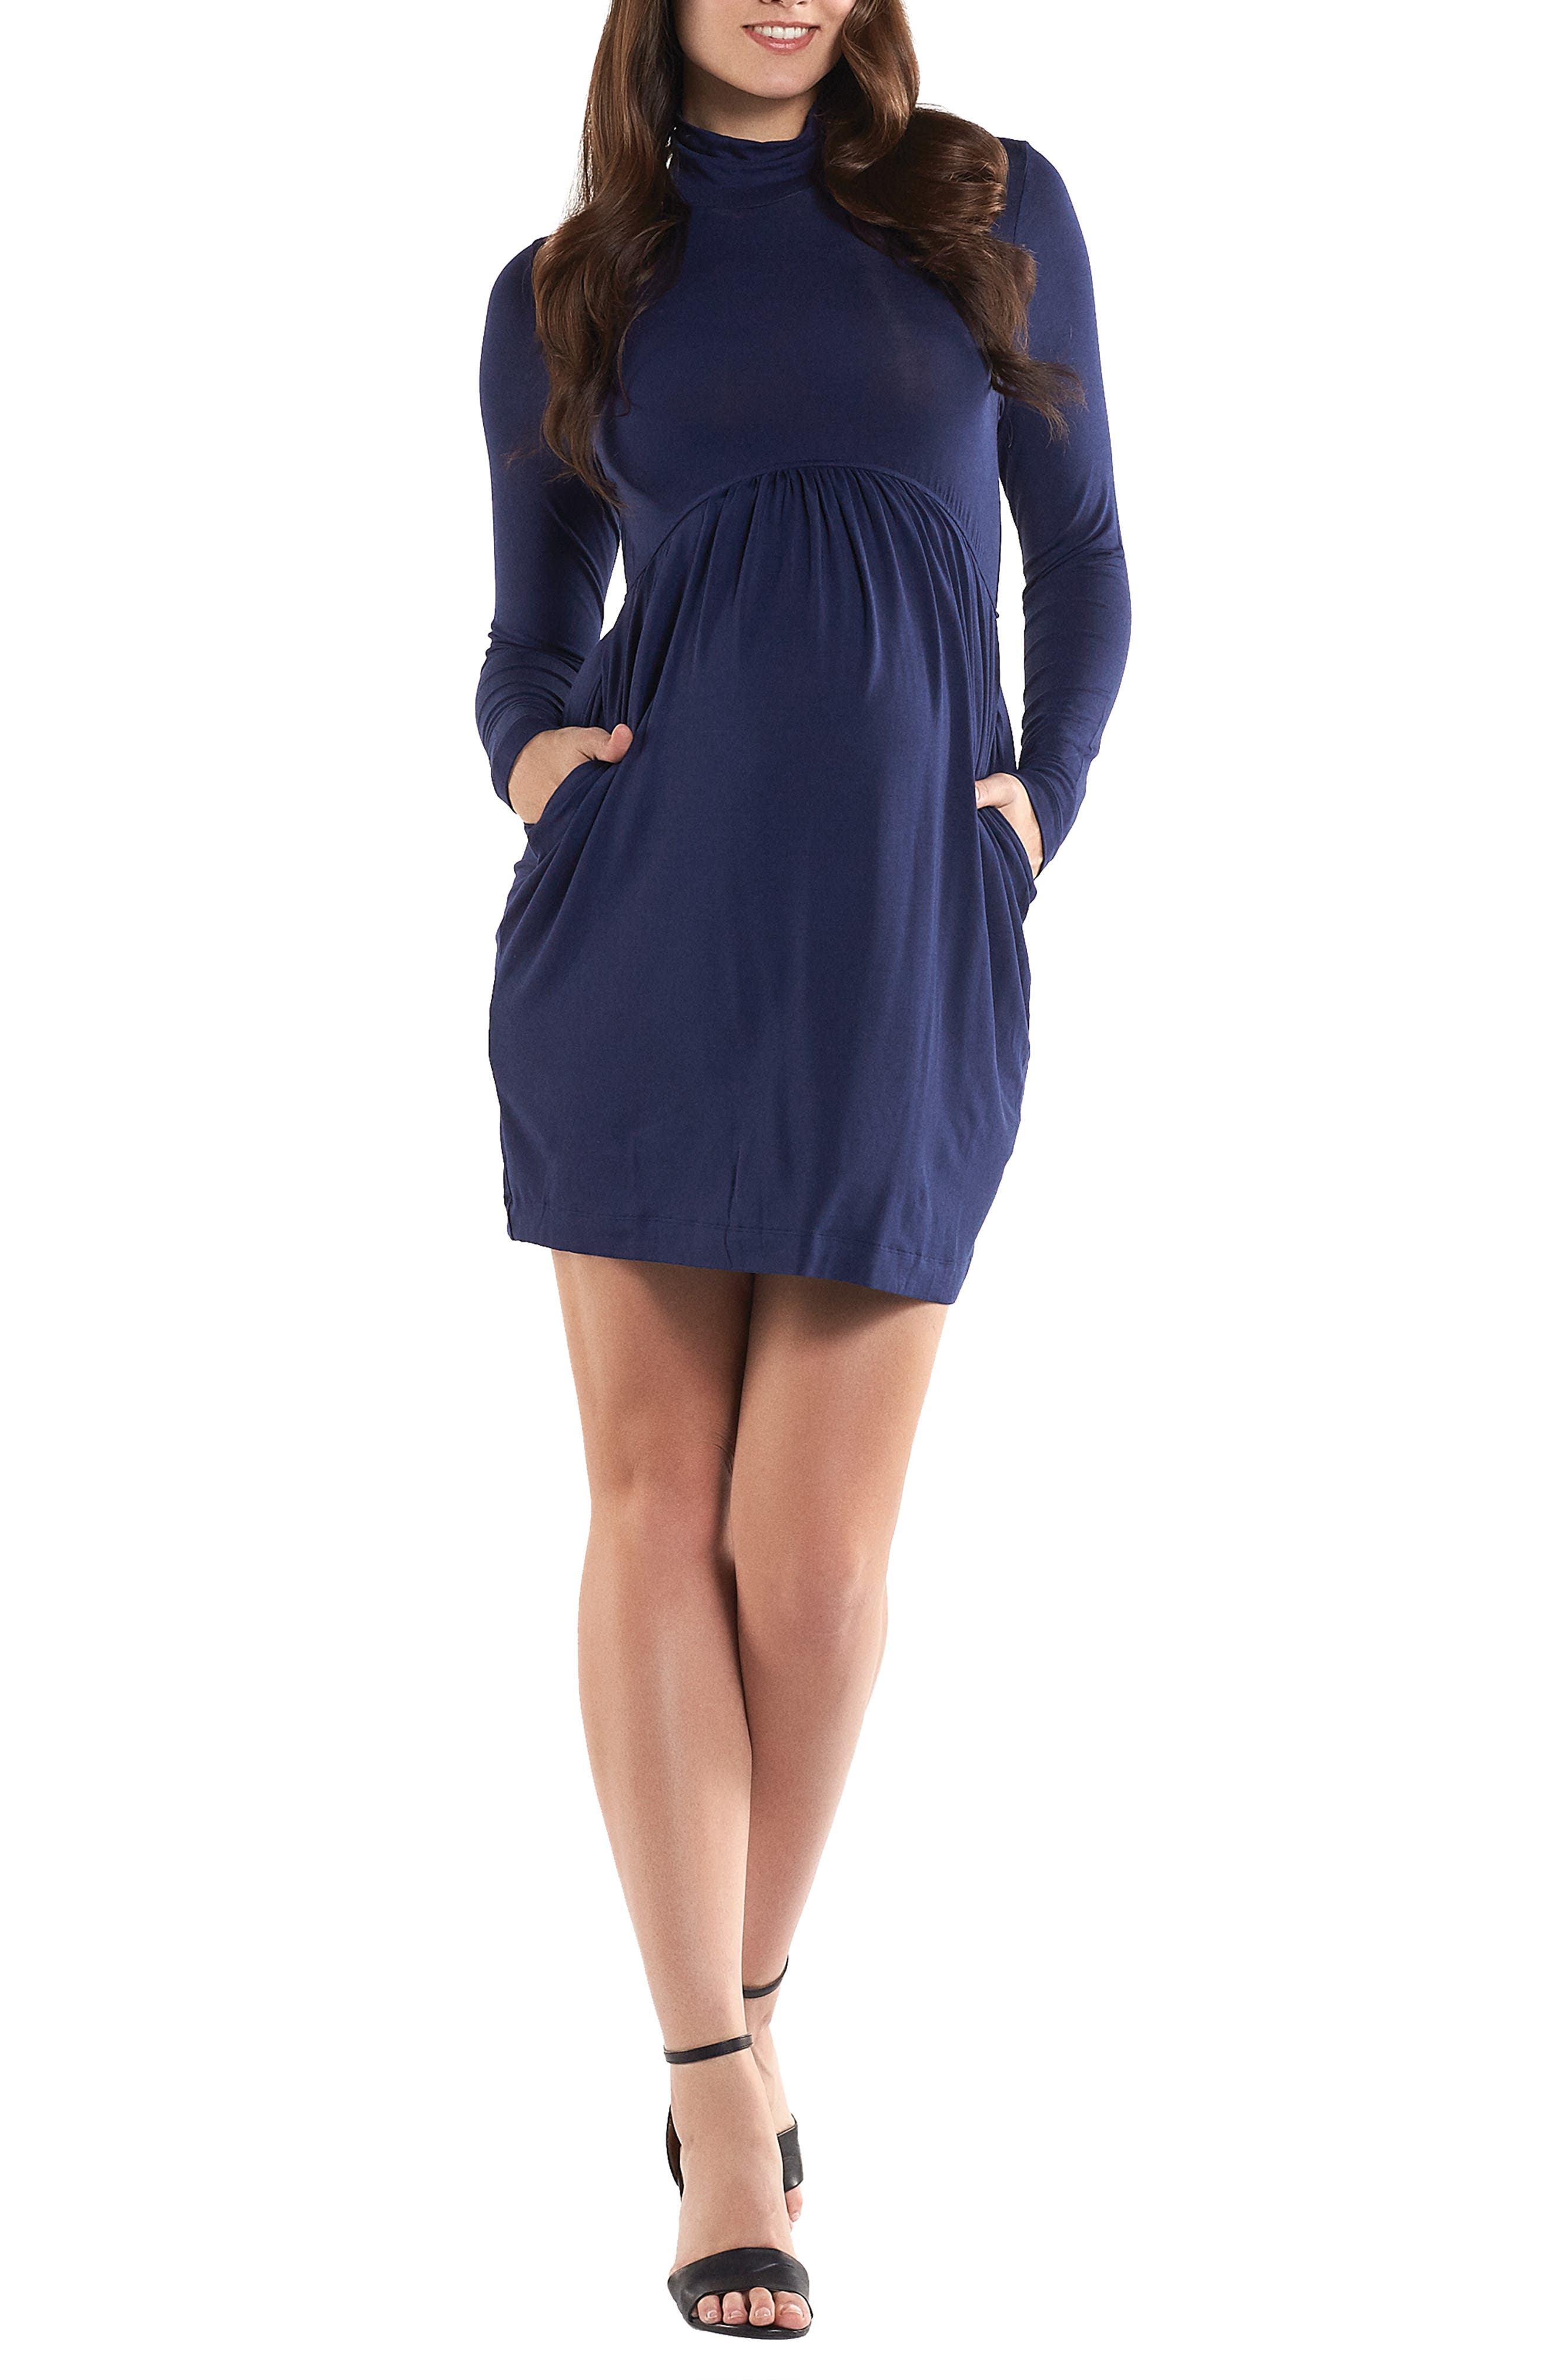 'Rhiannon' Turtleneck Fit & Flare Maternity Dress,                         Main,                         color, PEACOAT